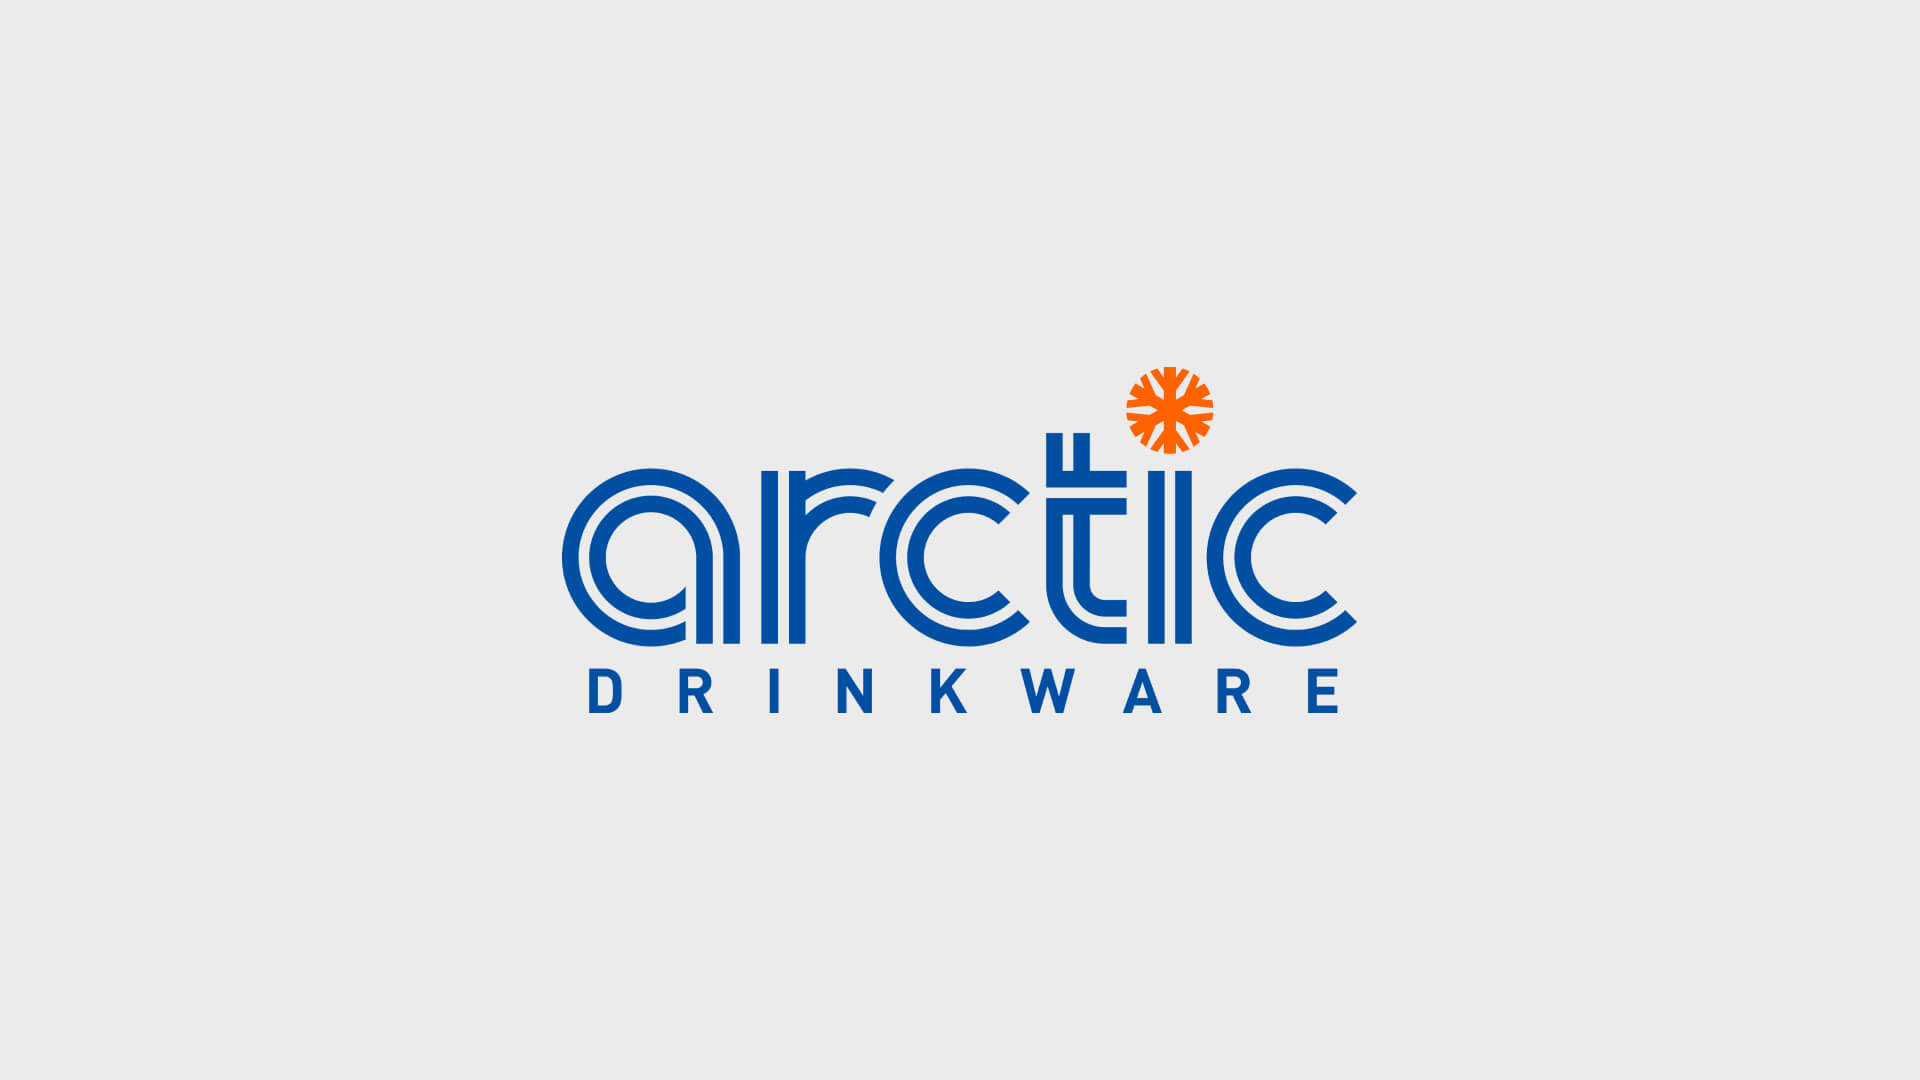 Arctic-Drinkware-logo